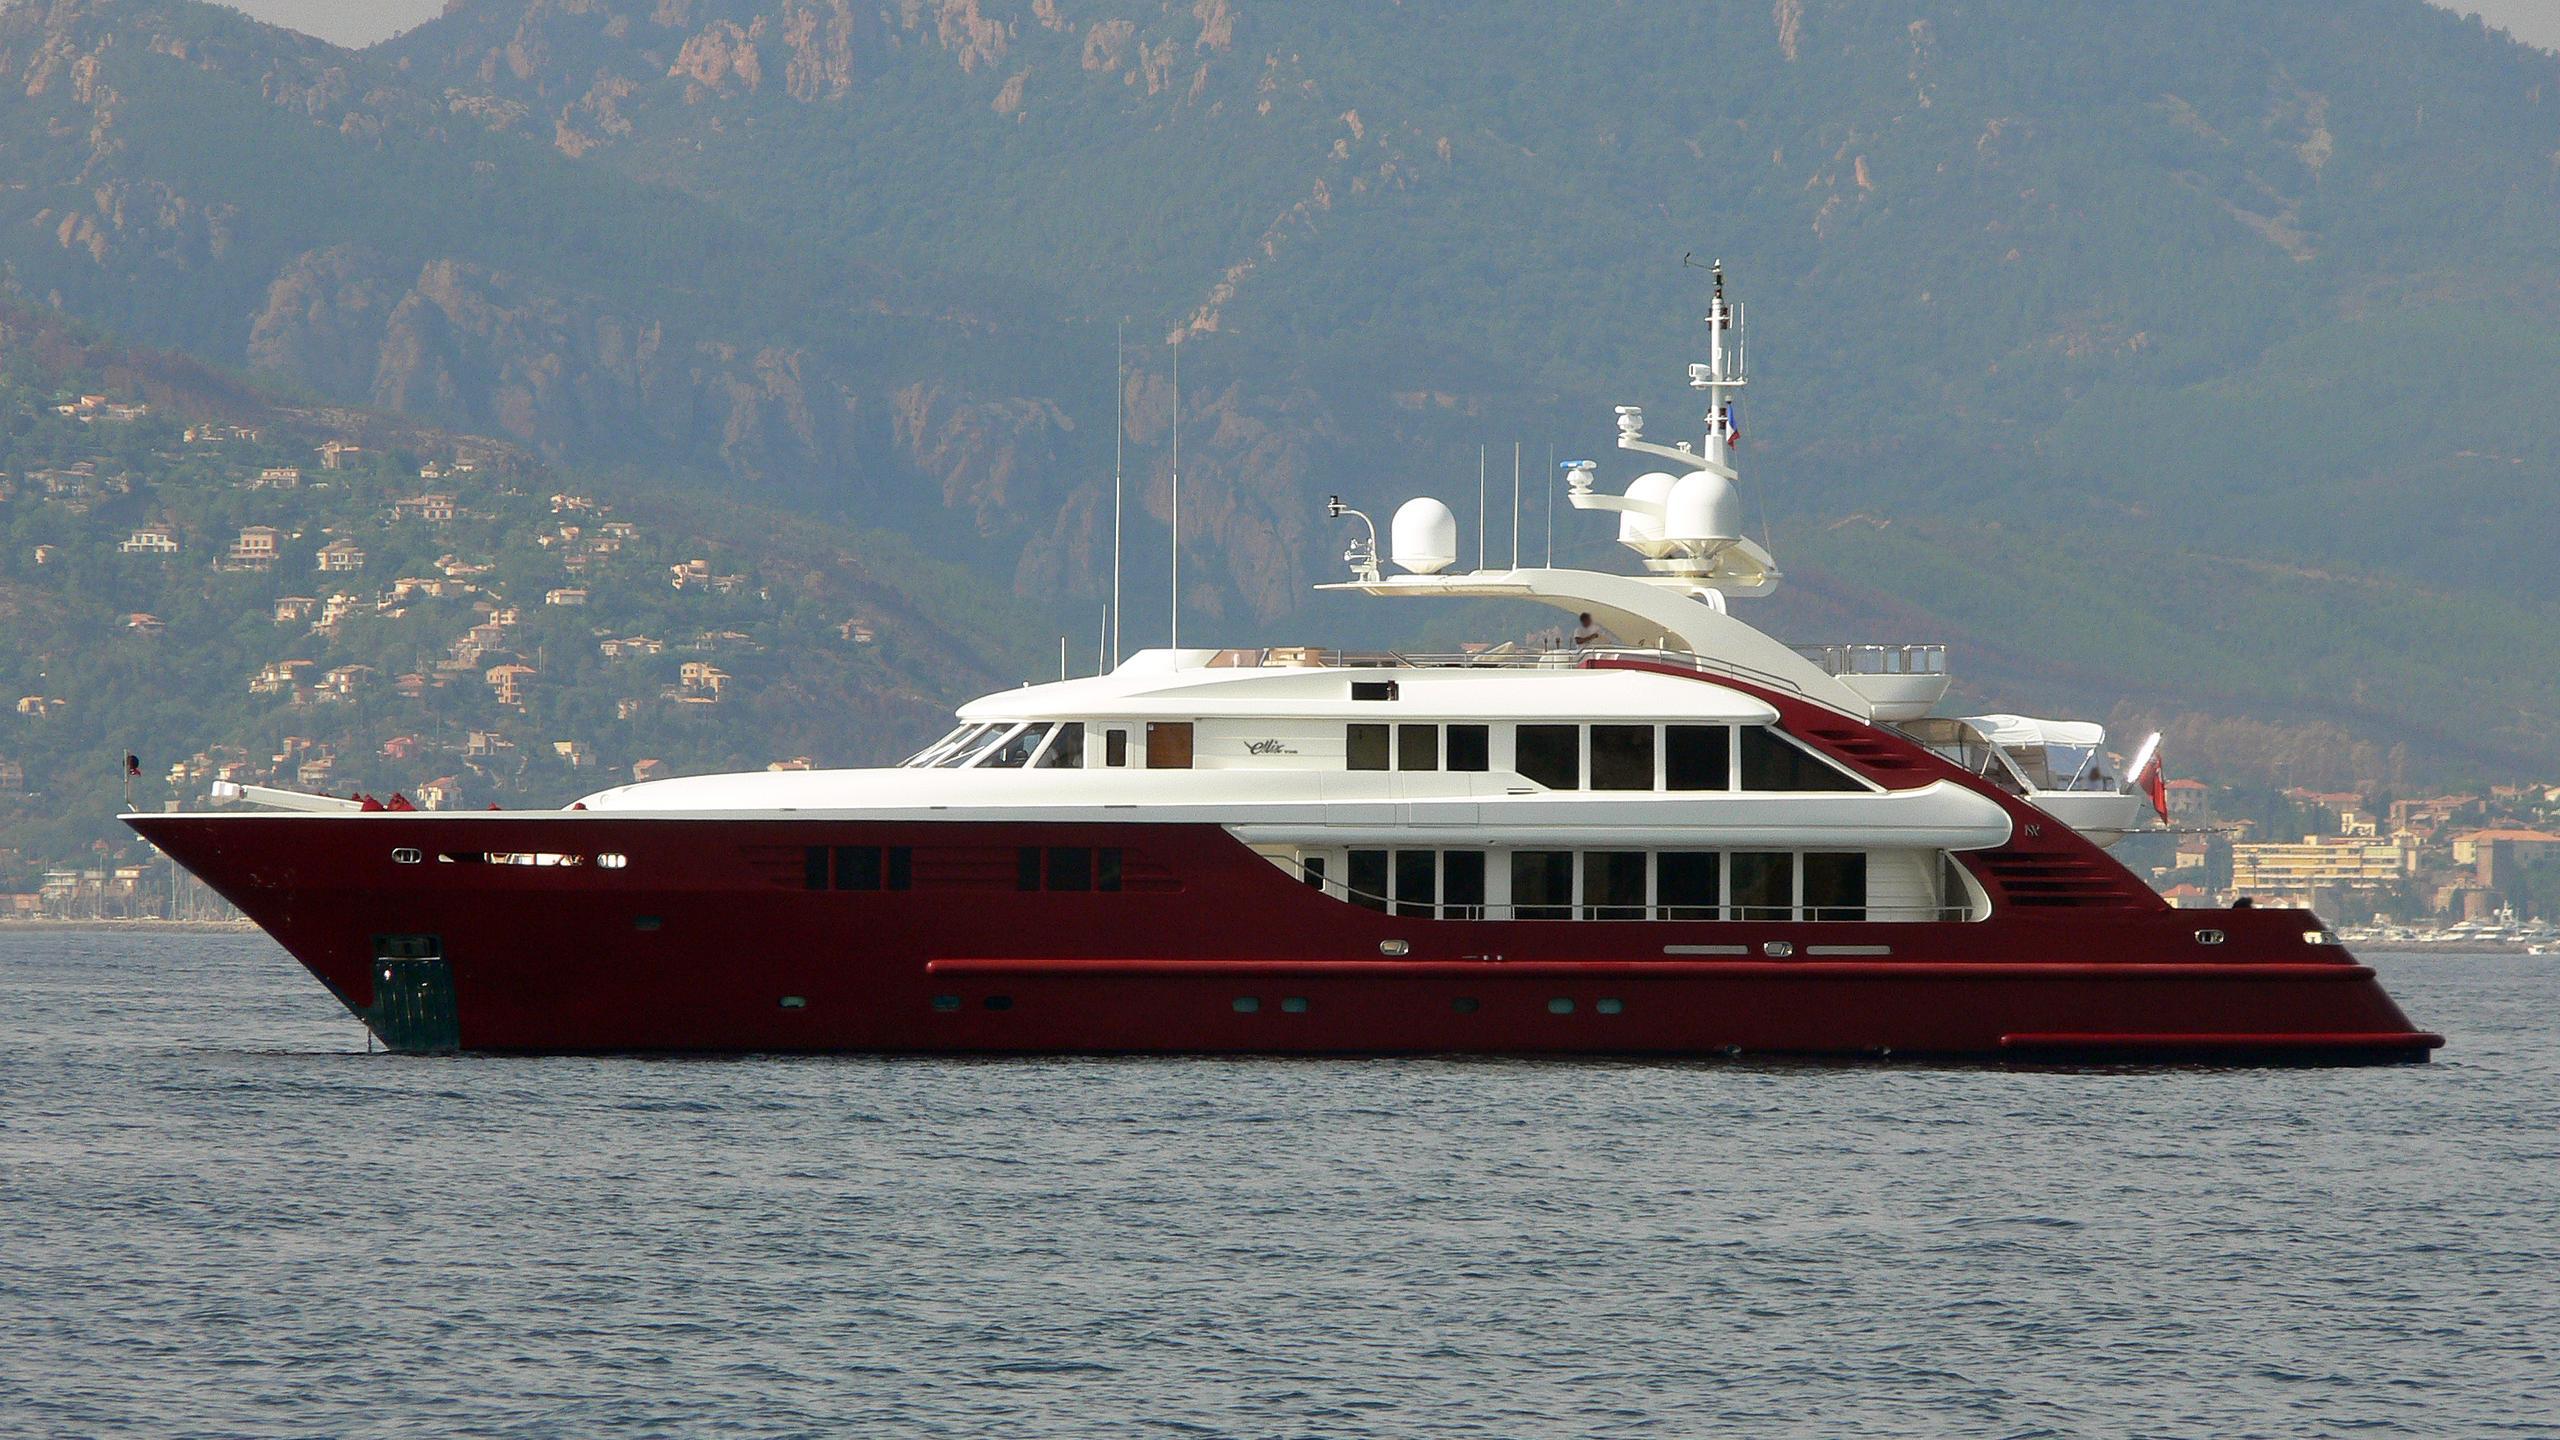 ledra-motor-yacht-isa-470-2004-47m-profile-before-refit